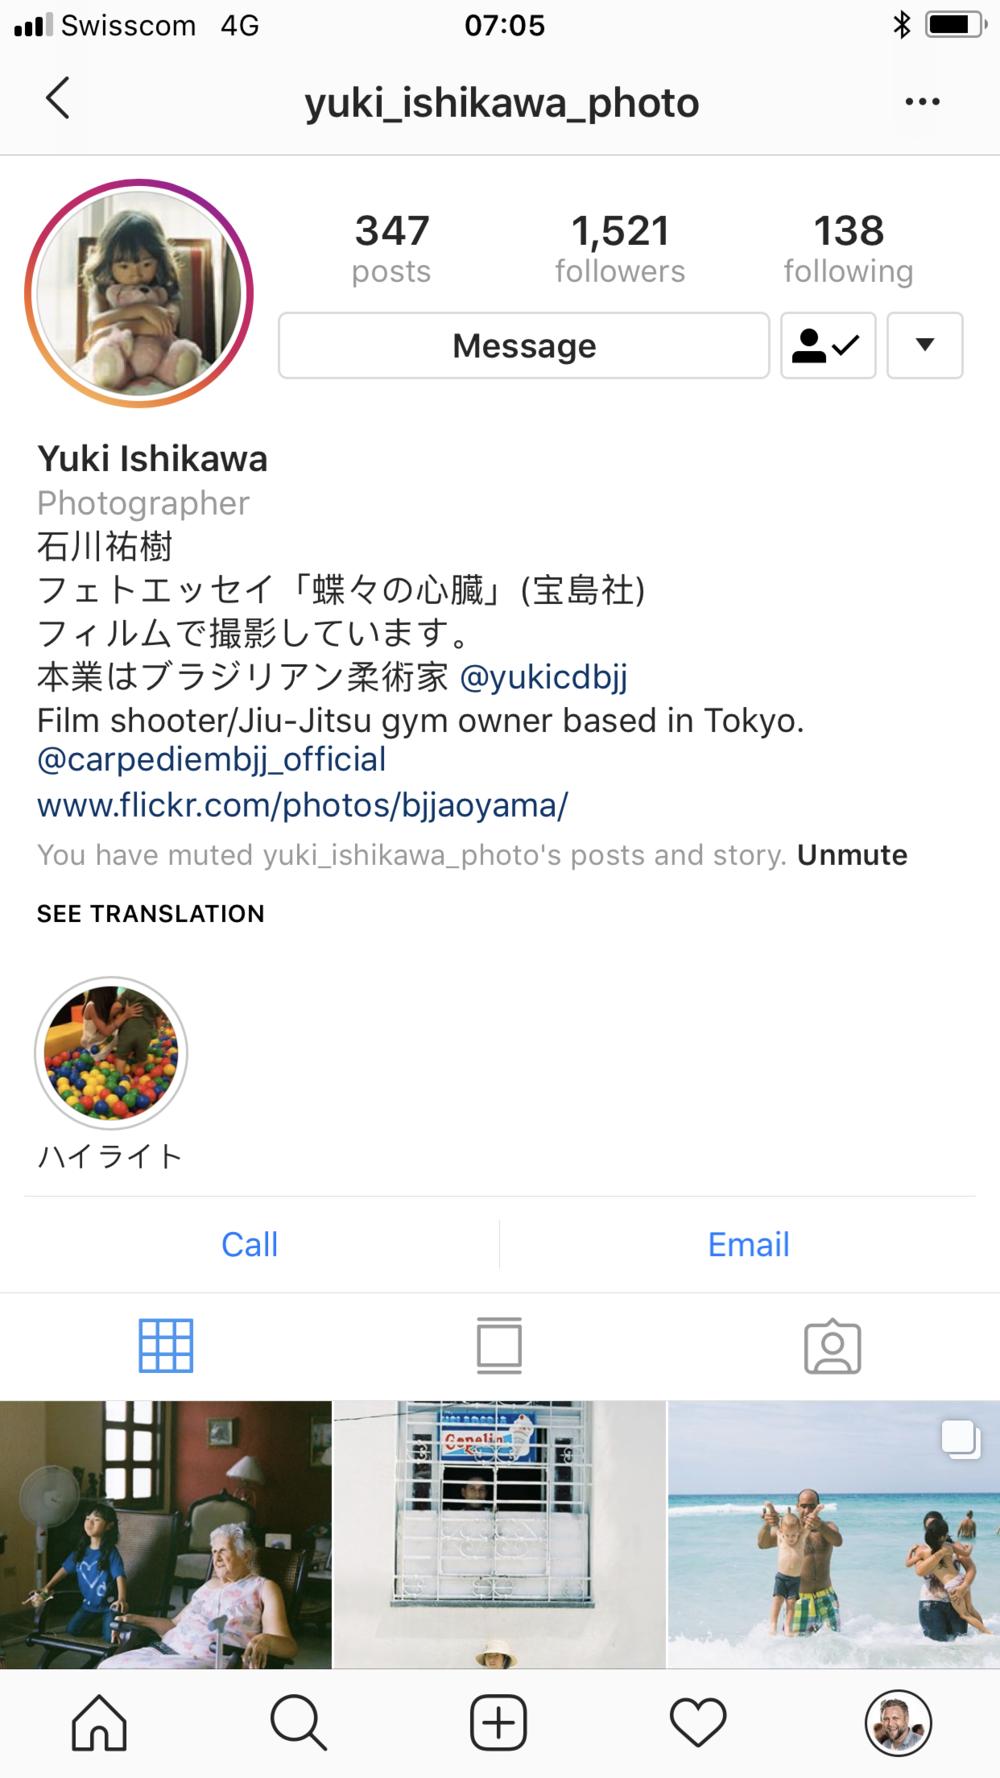 Dan_Roznov_Instagram_Storytelling_digitalEVENT2018_6.png